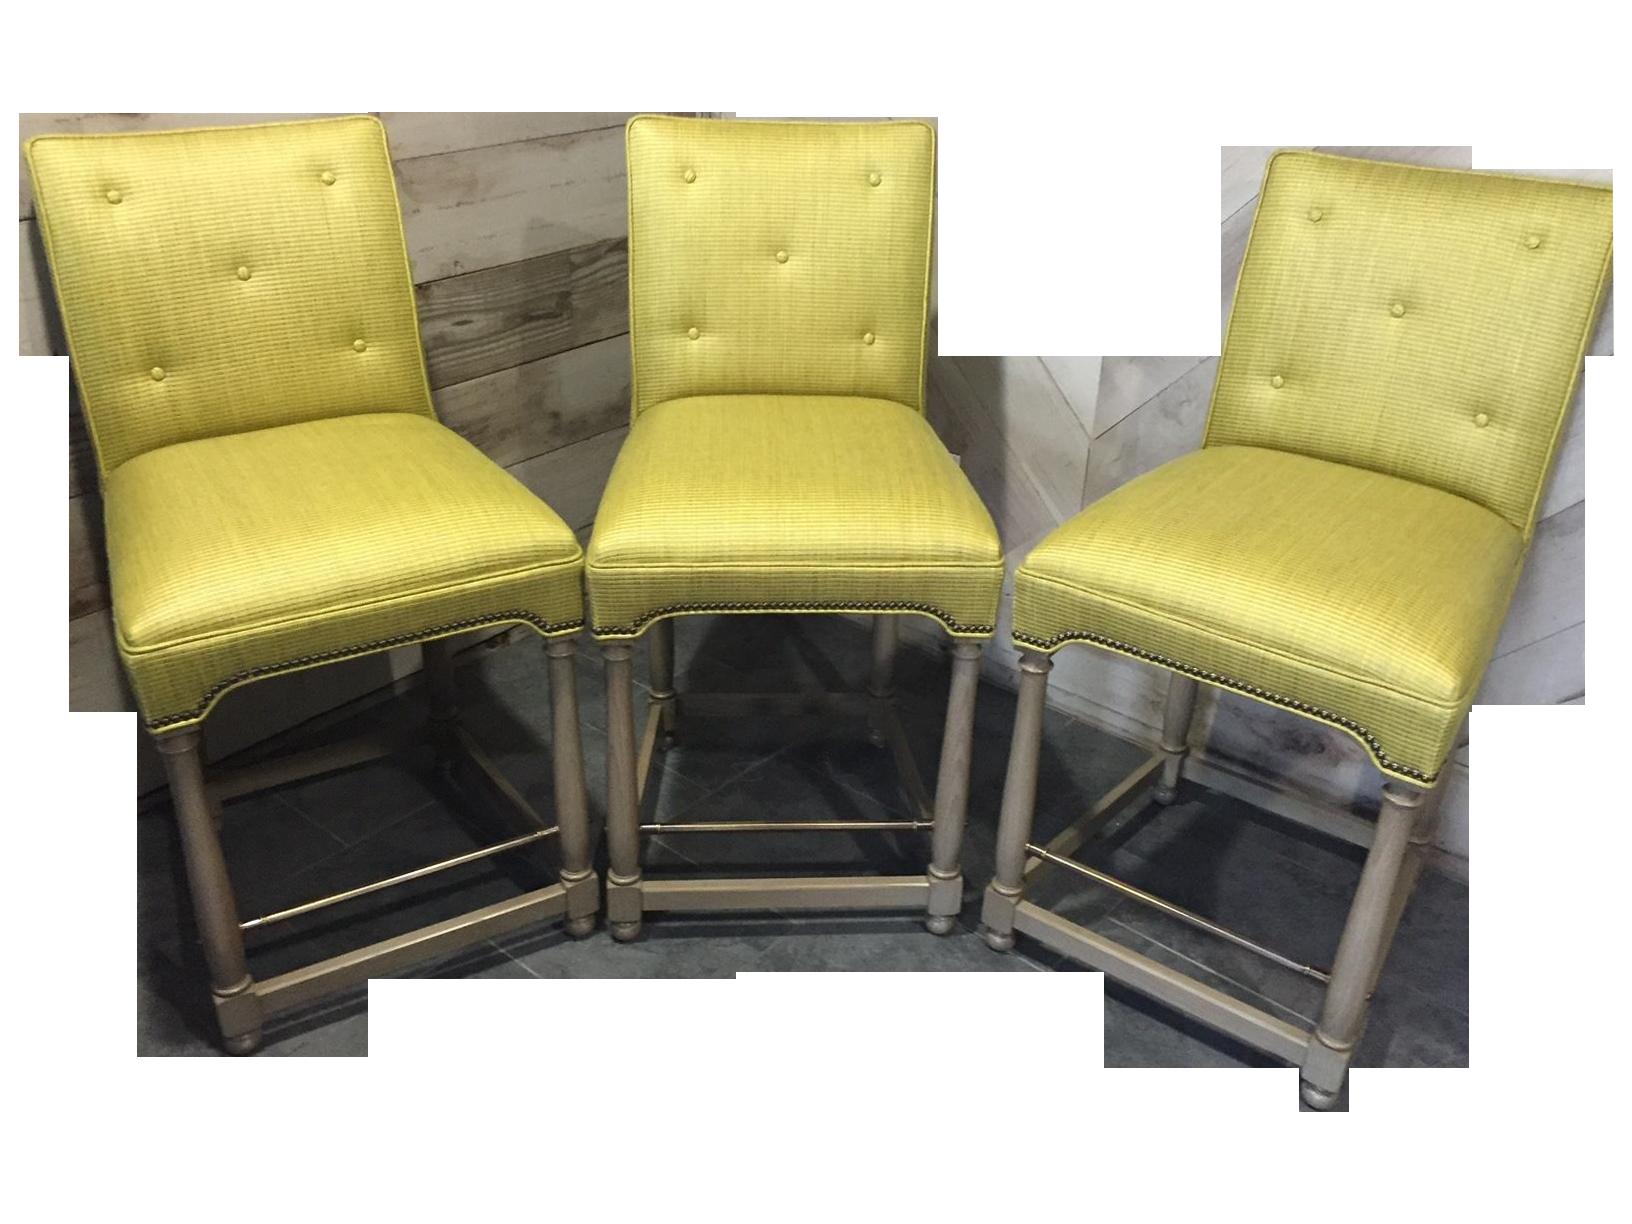 Custom Hickory Chair Bar Stools Set Of 3 Chairish